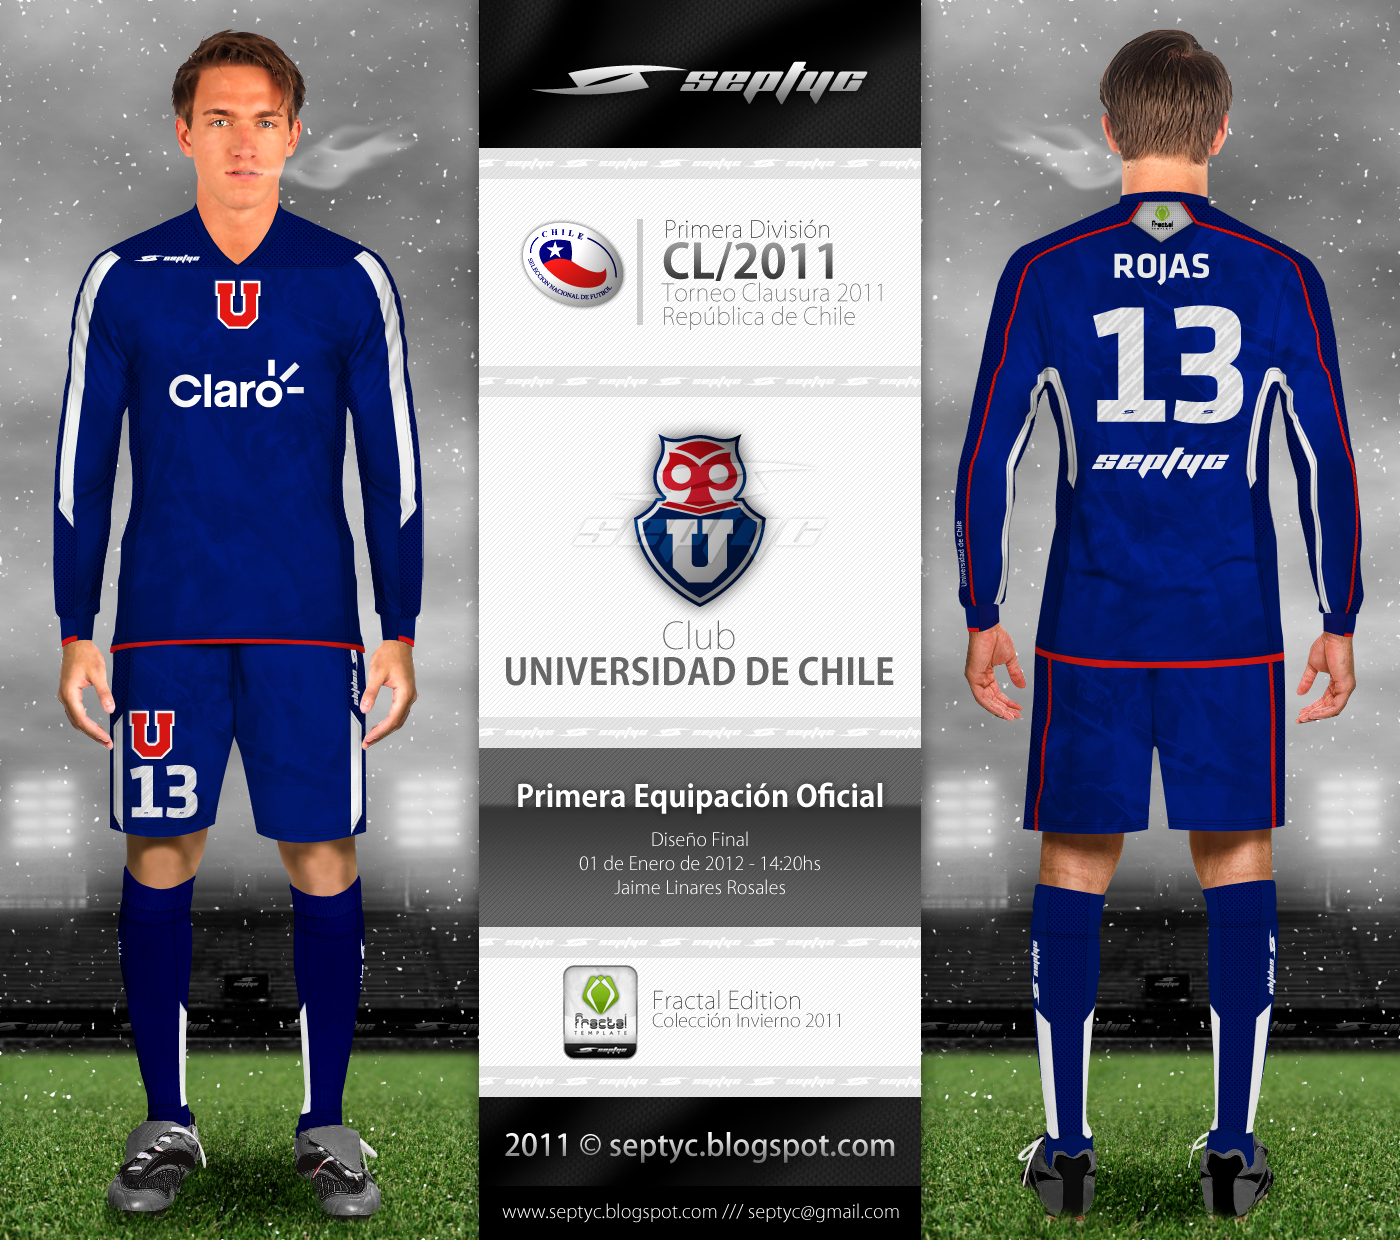 http://2.bp.blogspot.com/-9IBiTdIBAlg/TwHpXZhQQ_I/AAAAAAAAAxo/3nsyZRPn3Zc/s1600/U-de-Chile.jpg